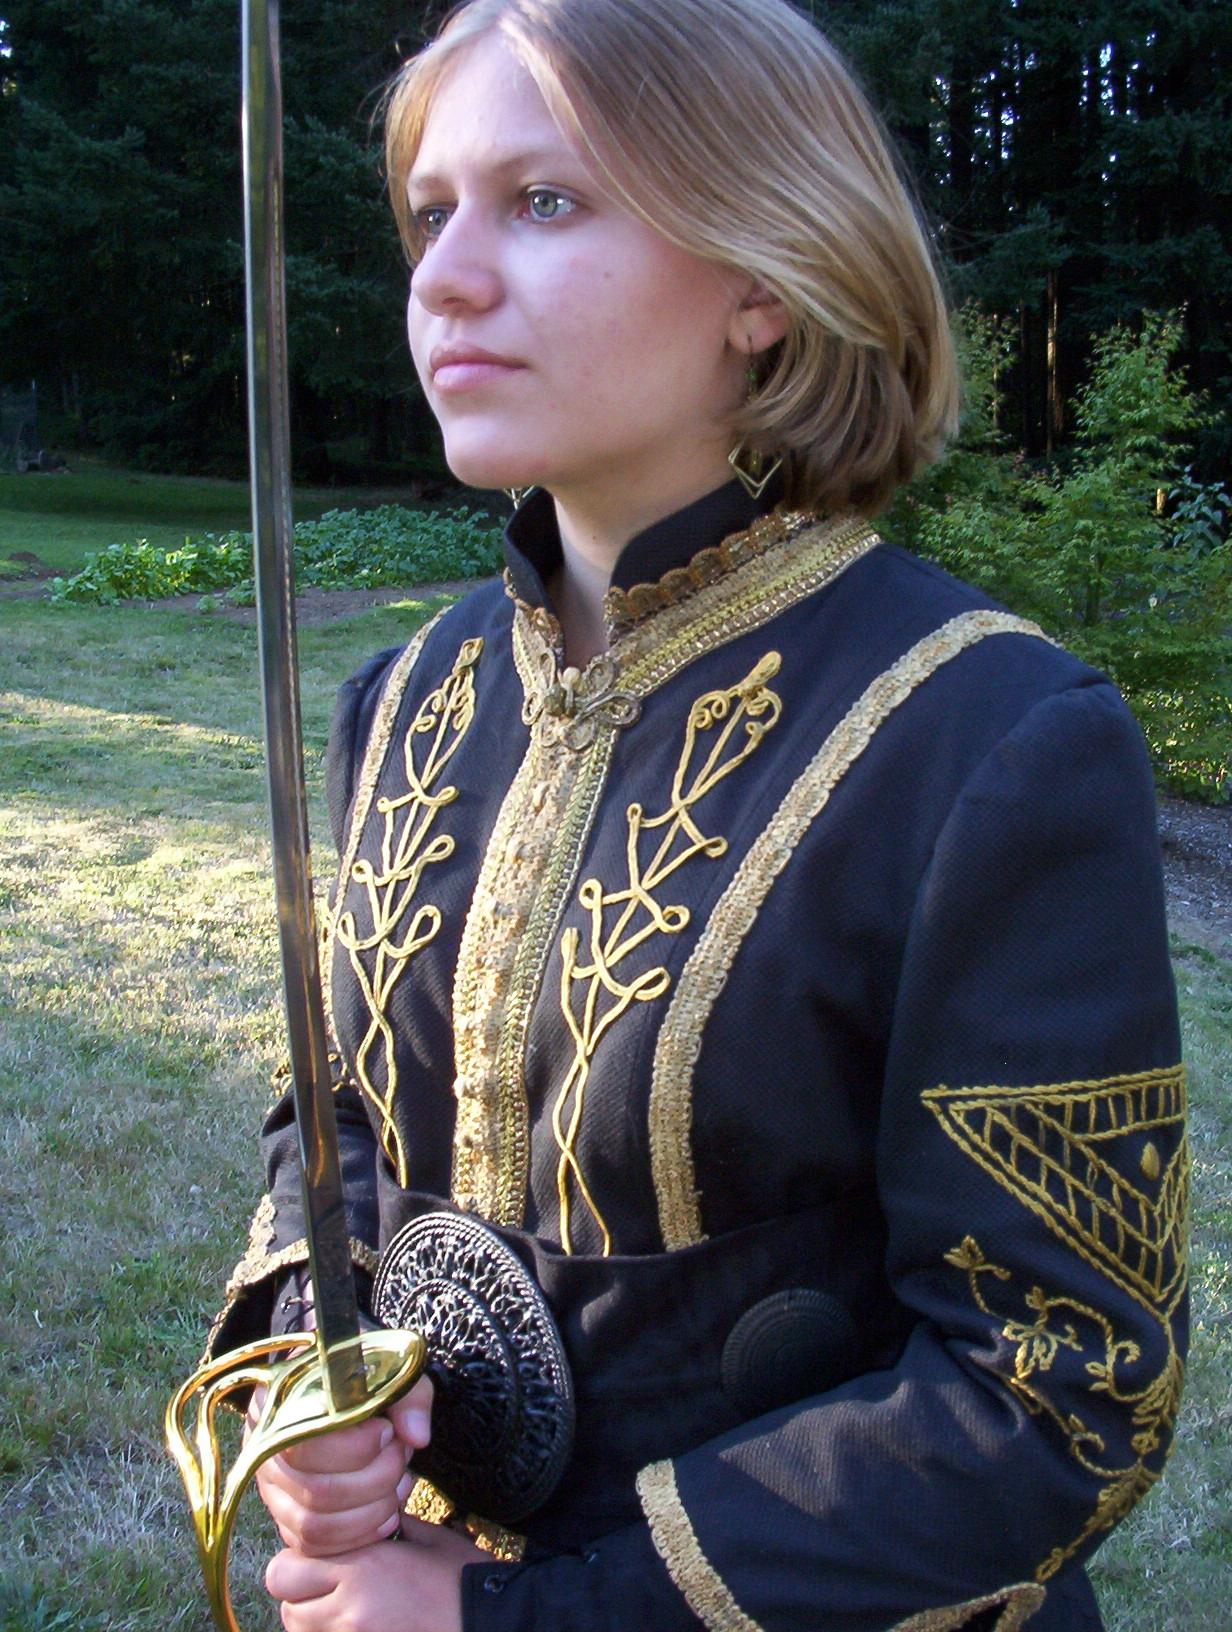 BlackGold Pirate Costume Bekah pics 043.jpg